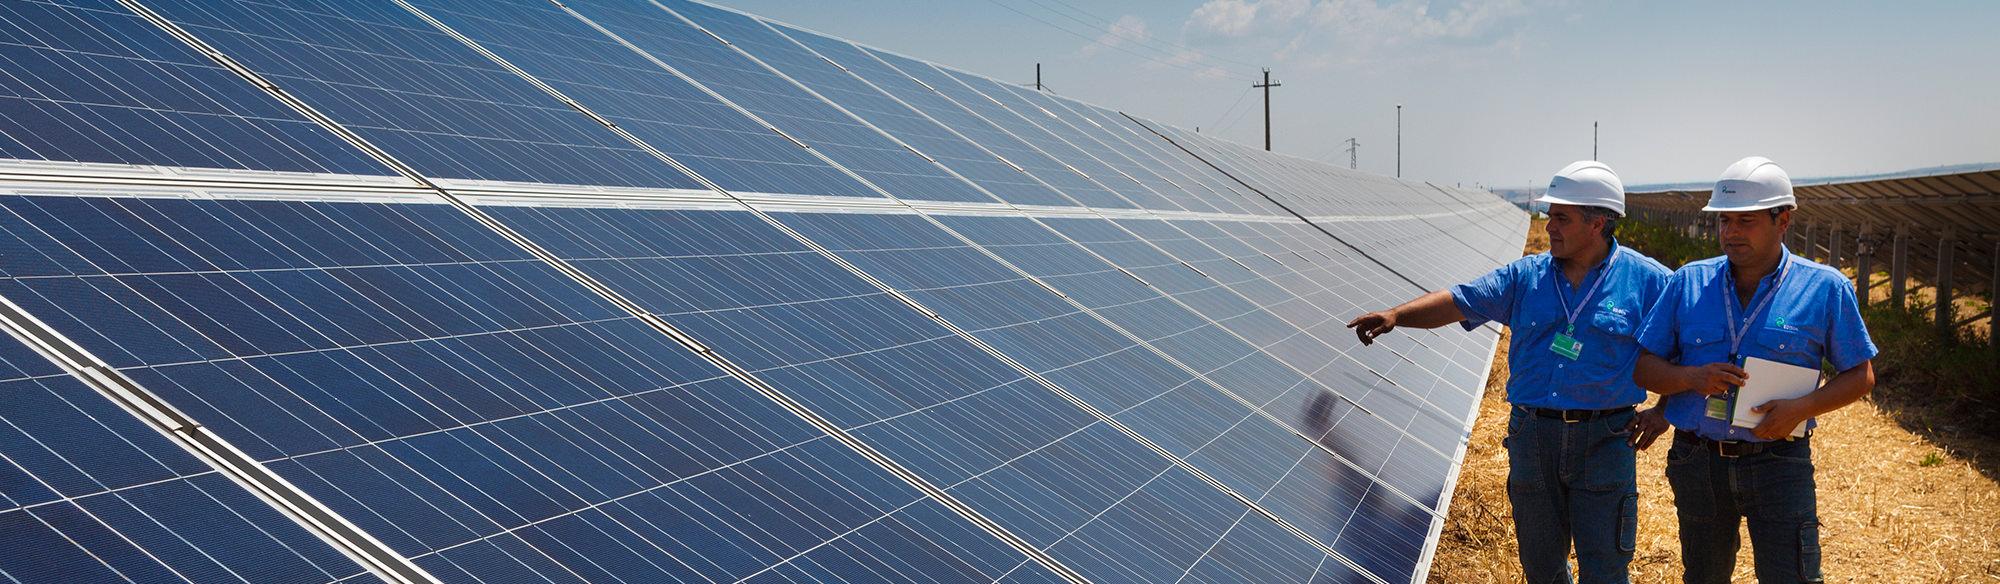 Bando Puglia efficienza energetica PMI